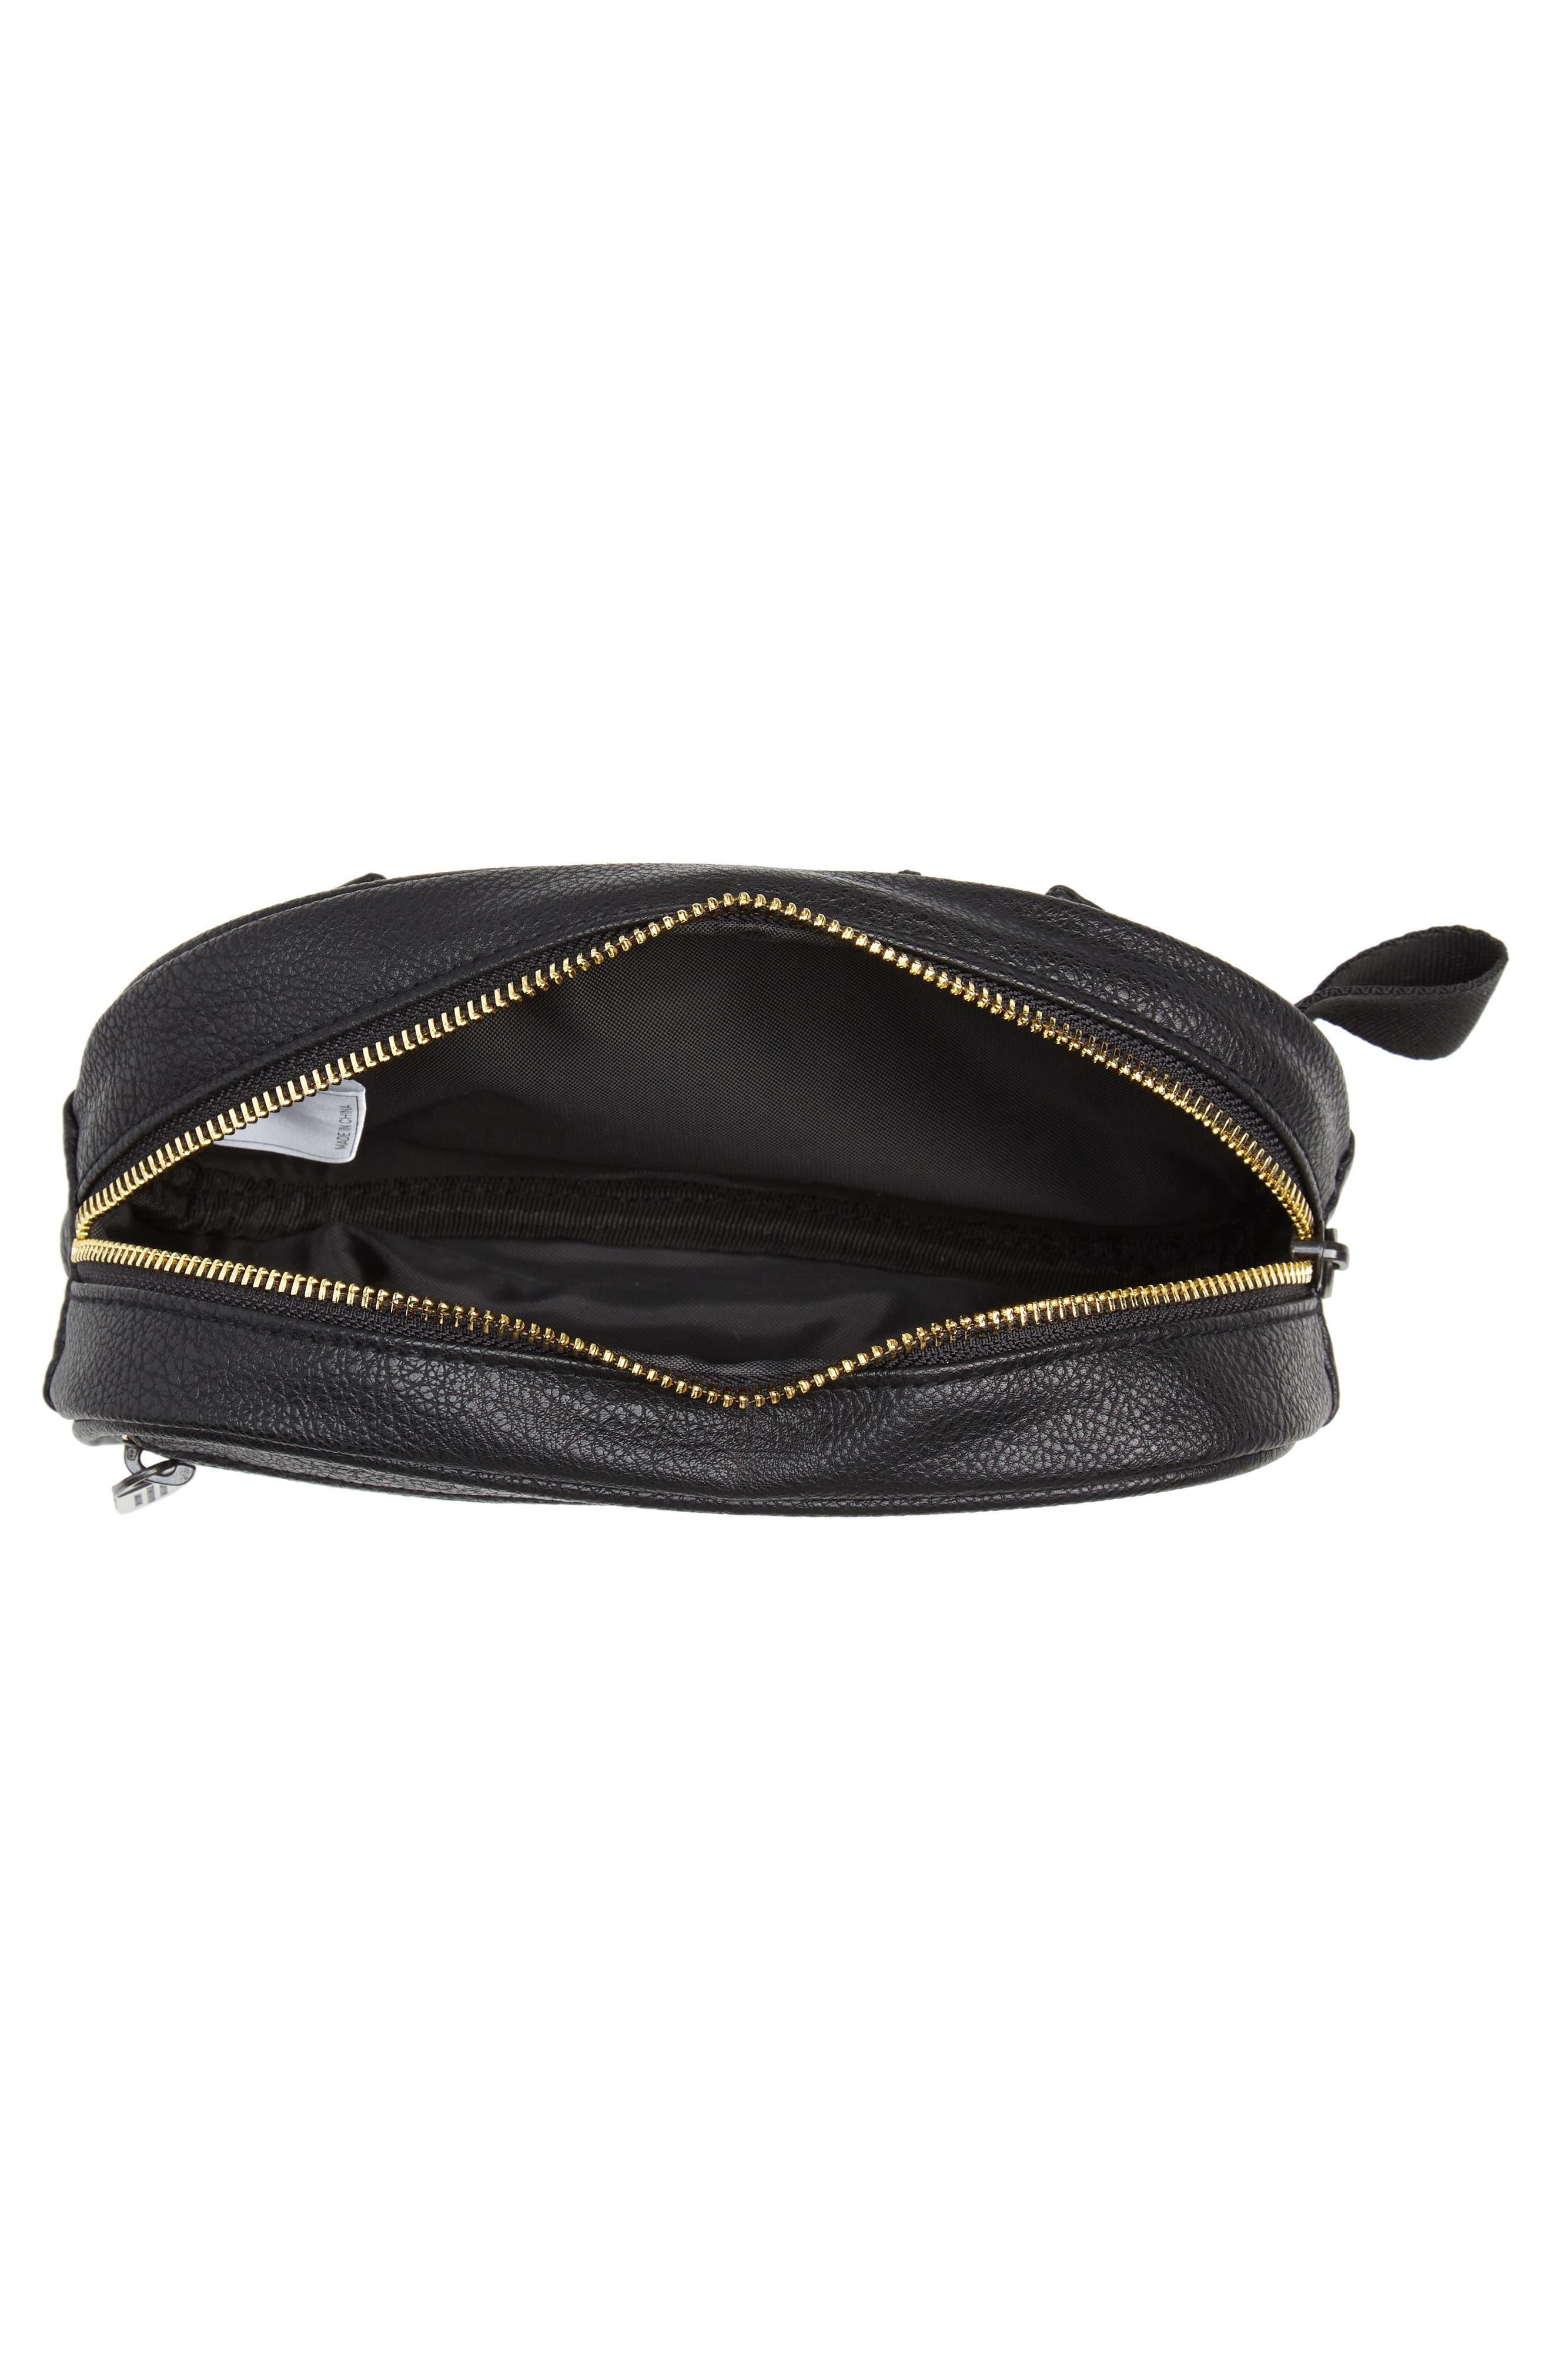 ADIDAS ORIGINALS, adidas Ori Faux Leather Fanny Pack, Alternate thumbnail 6, color, 001